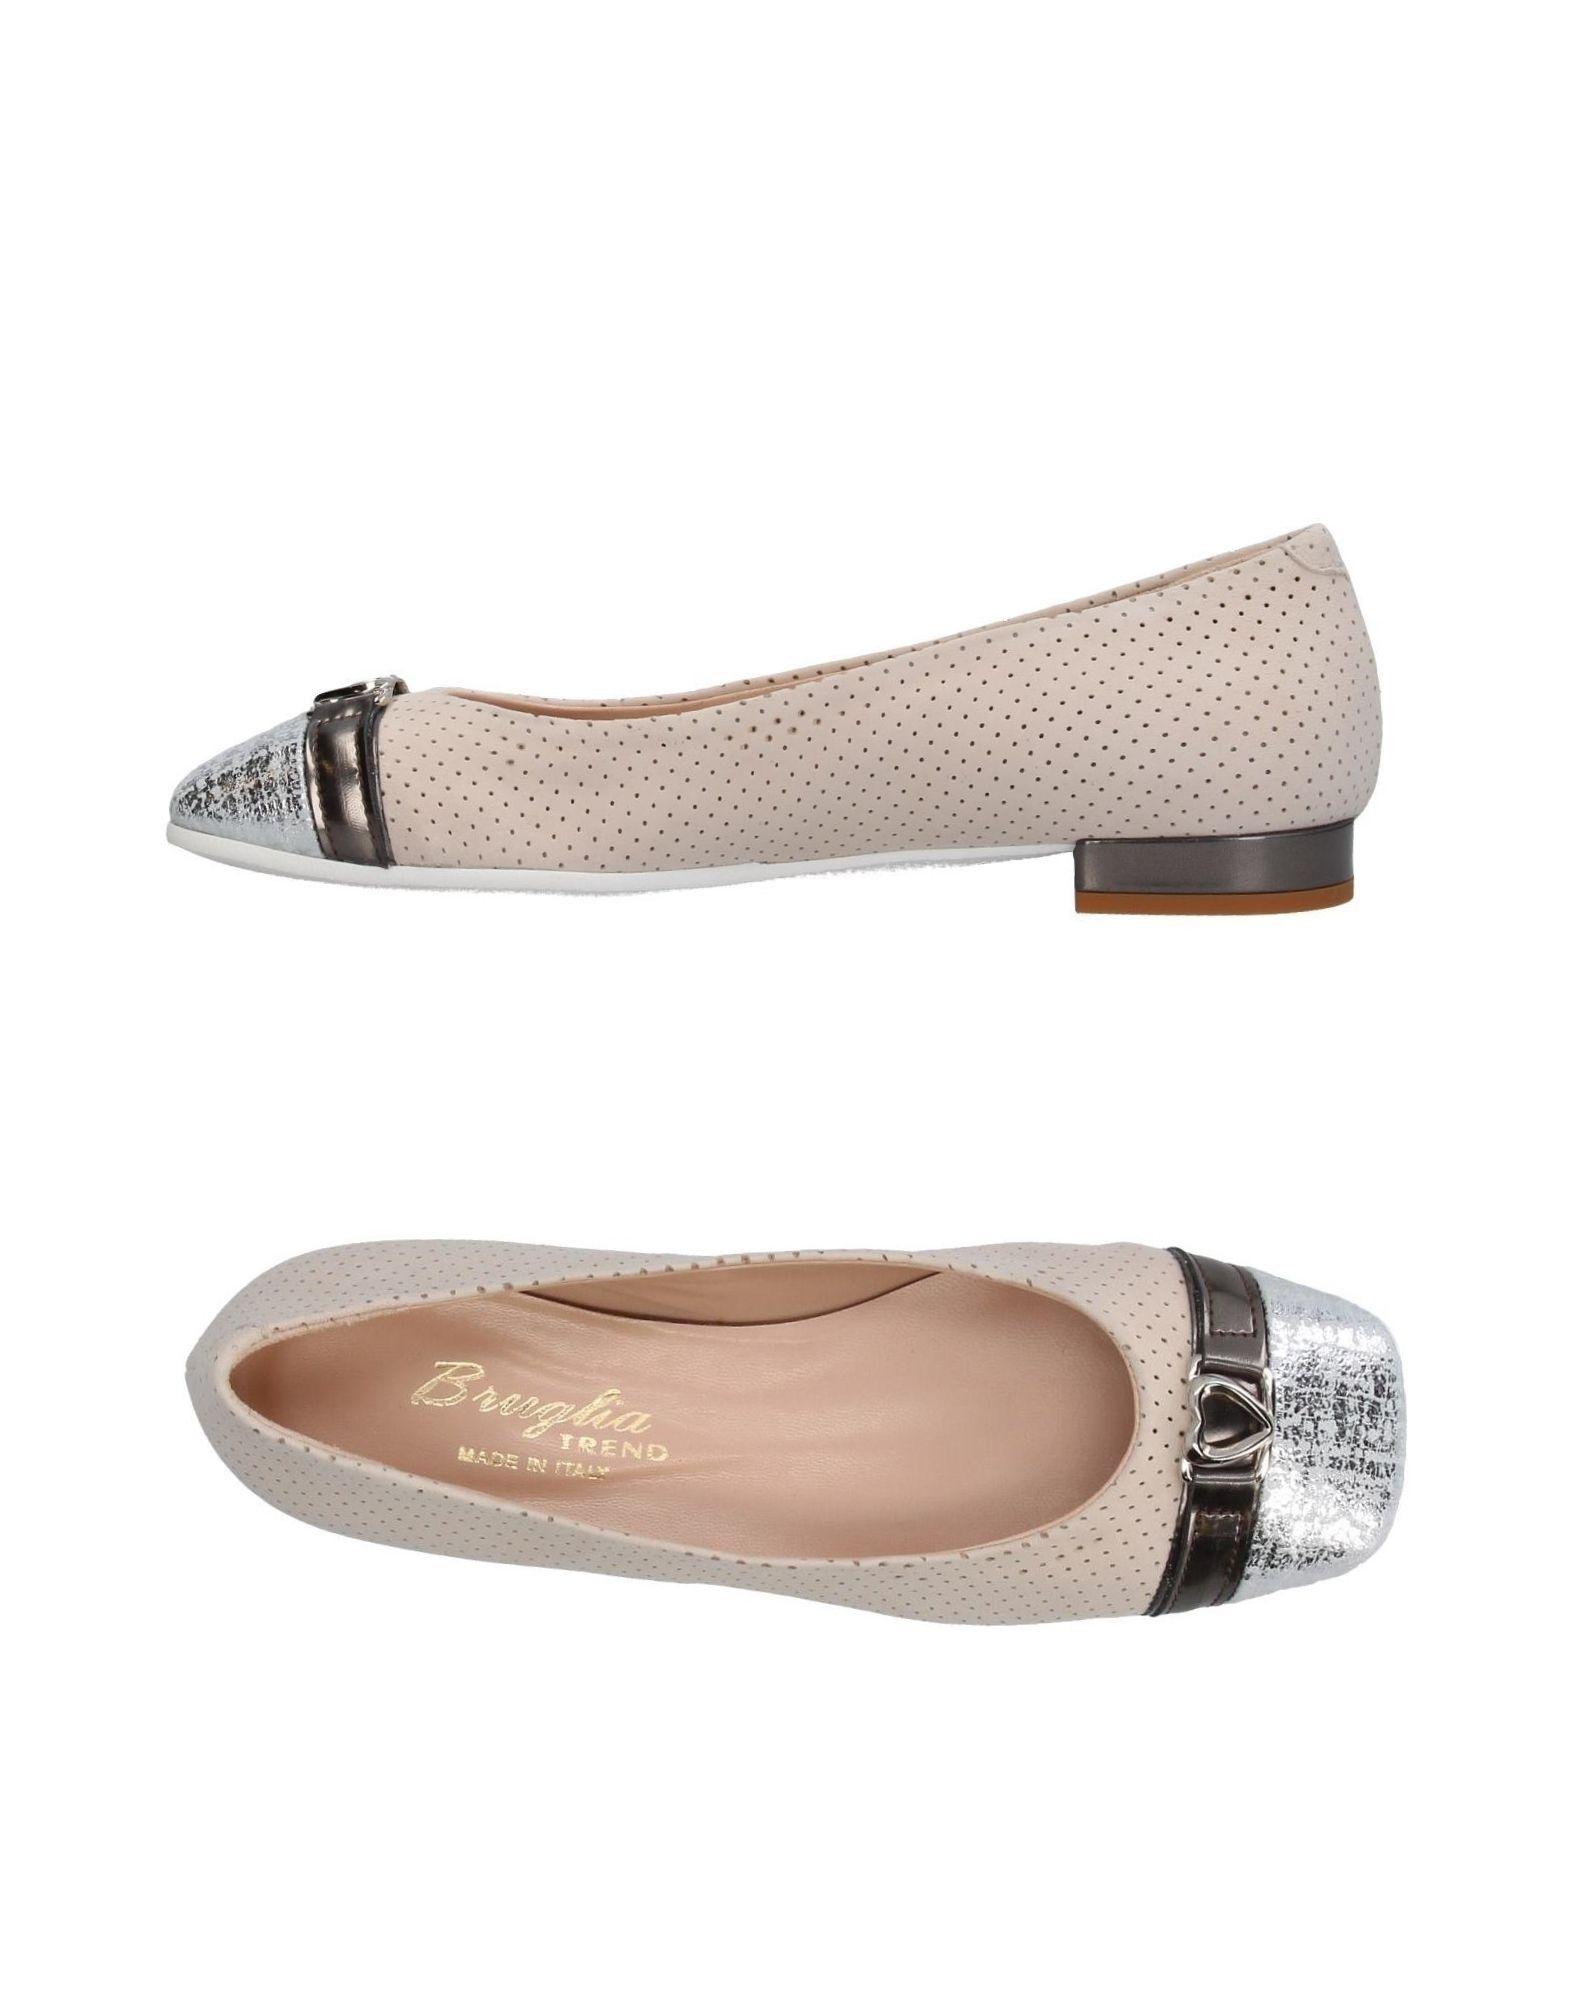 F.Lli Bruglia Ballerinas Damen  11408301OR Gute Qualität beliebte Schuhe